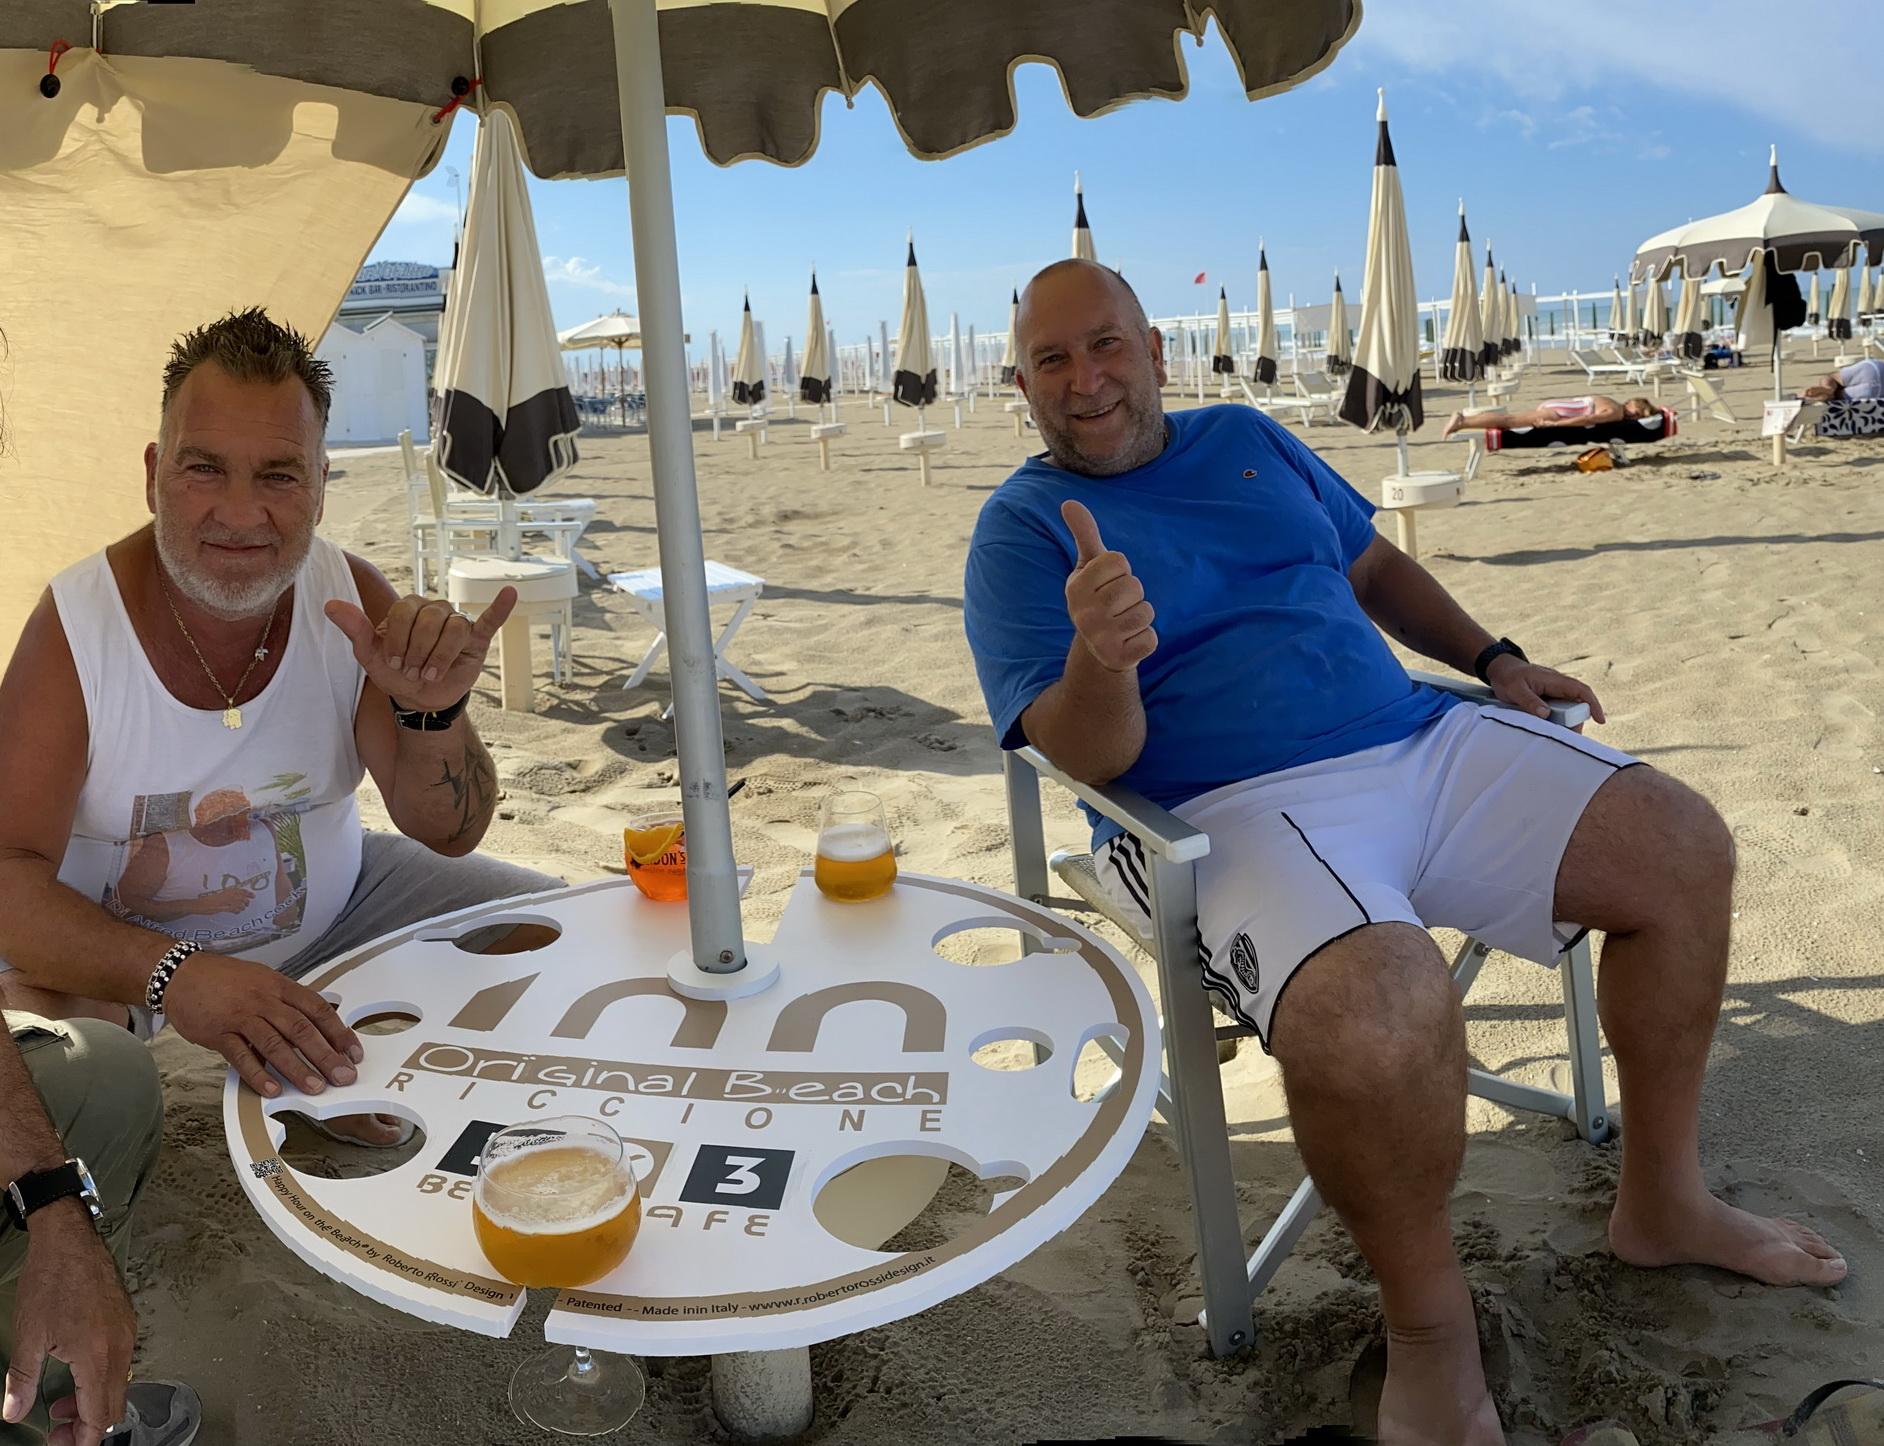 Happy hour on the beach® - Original Beac